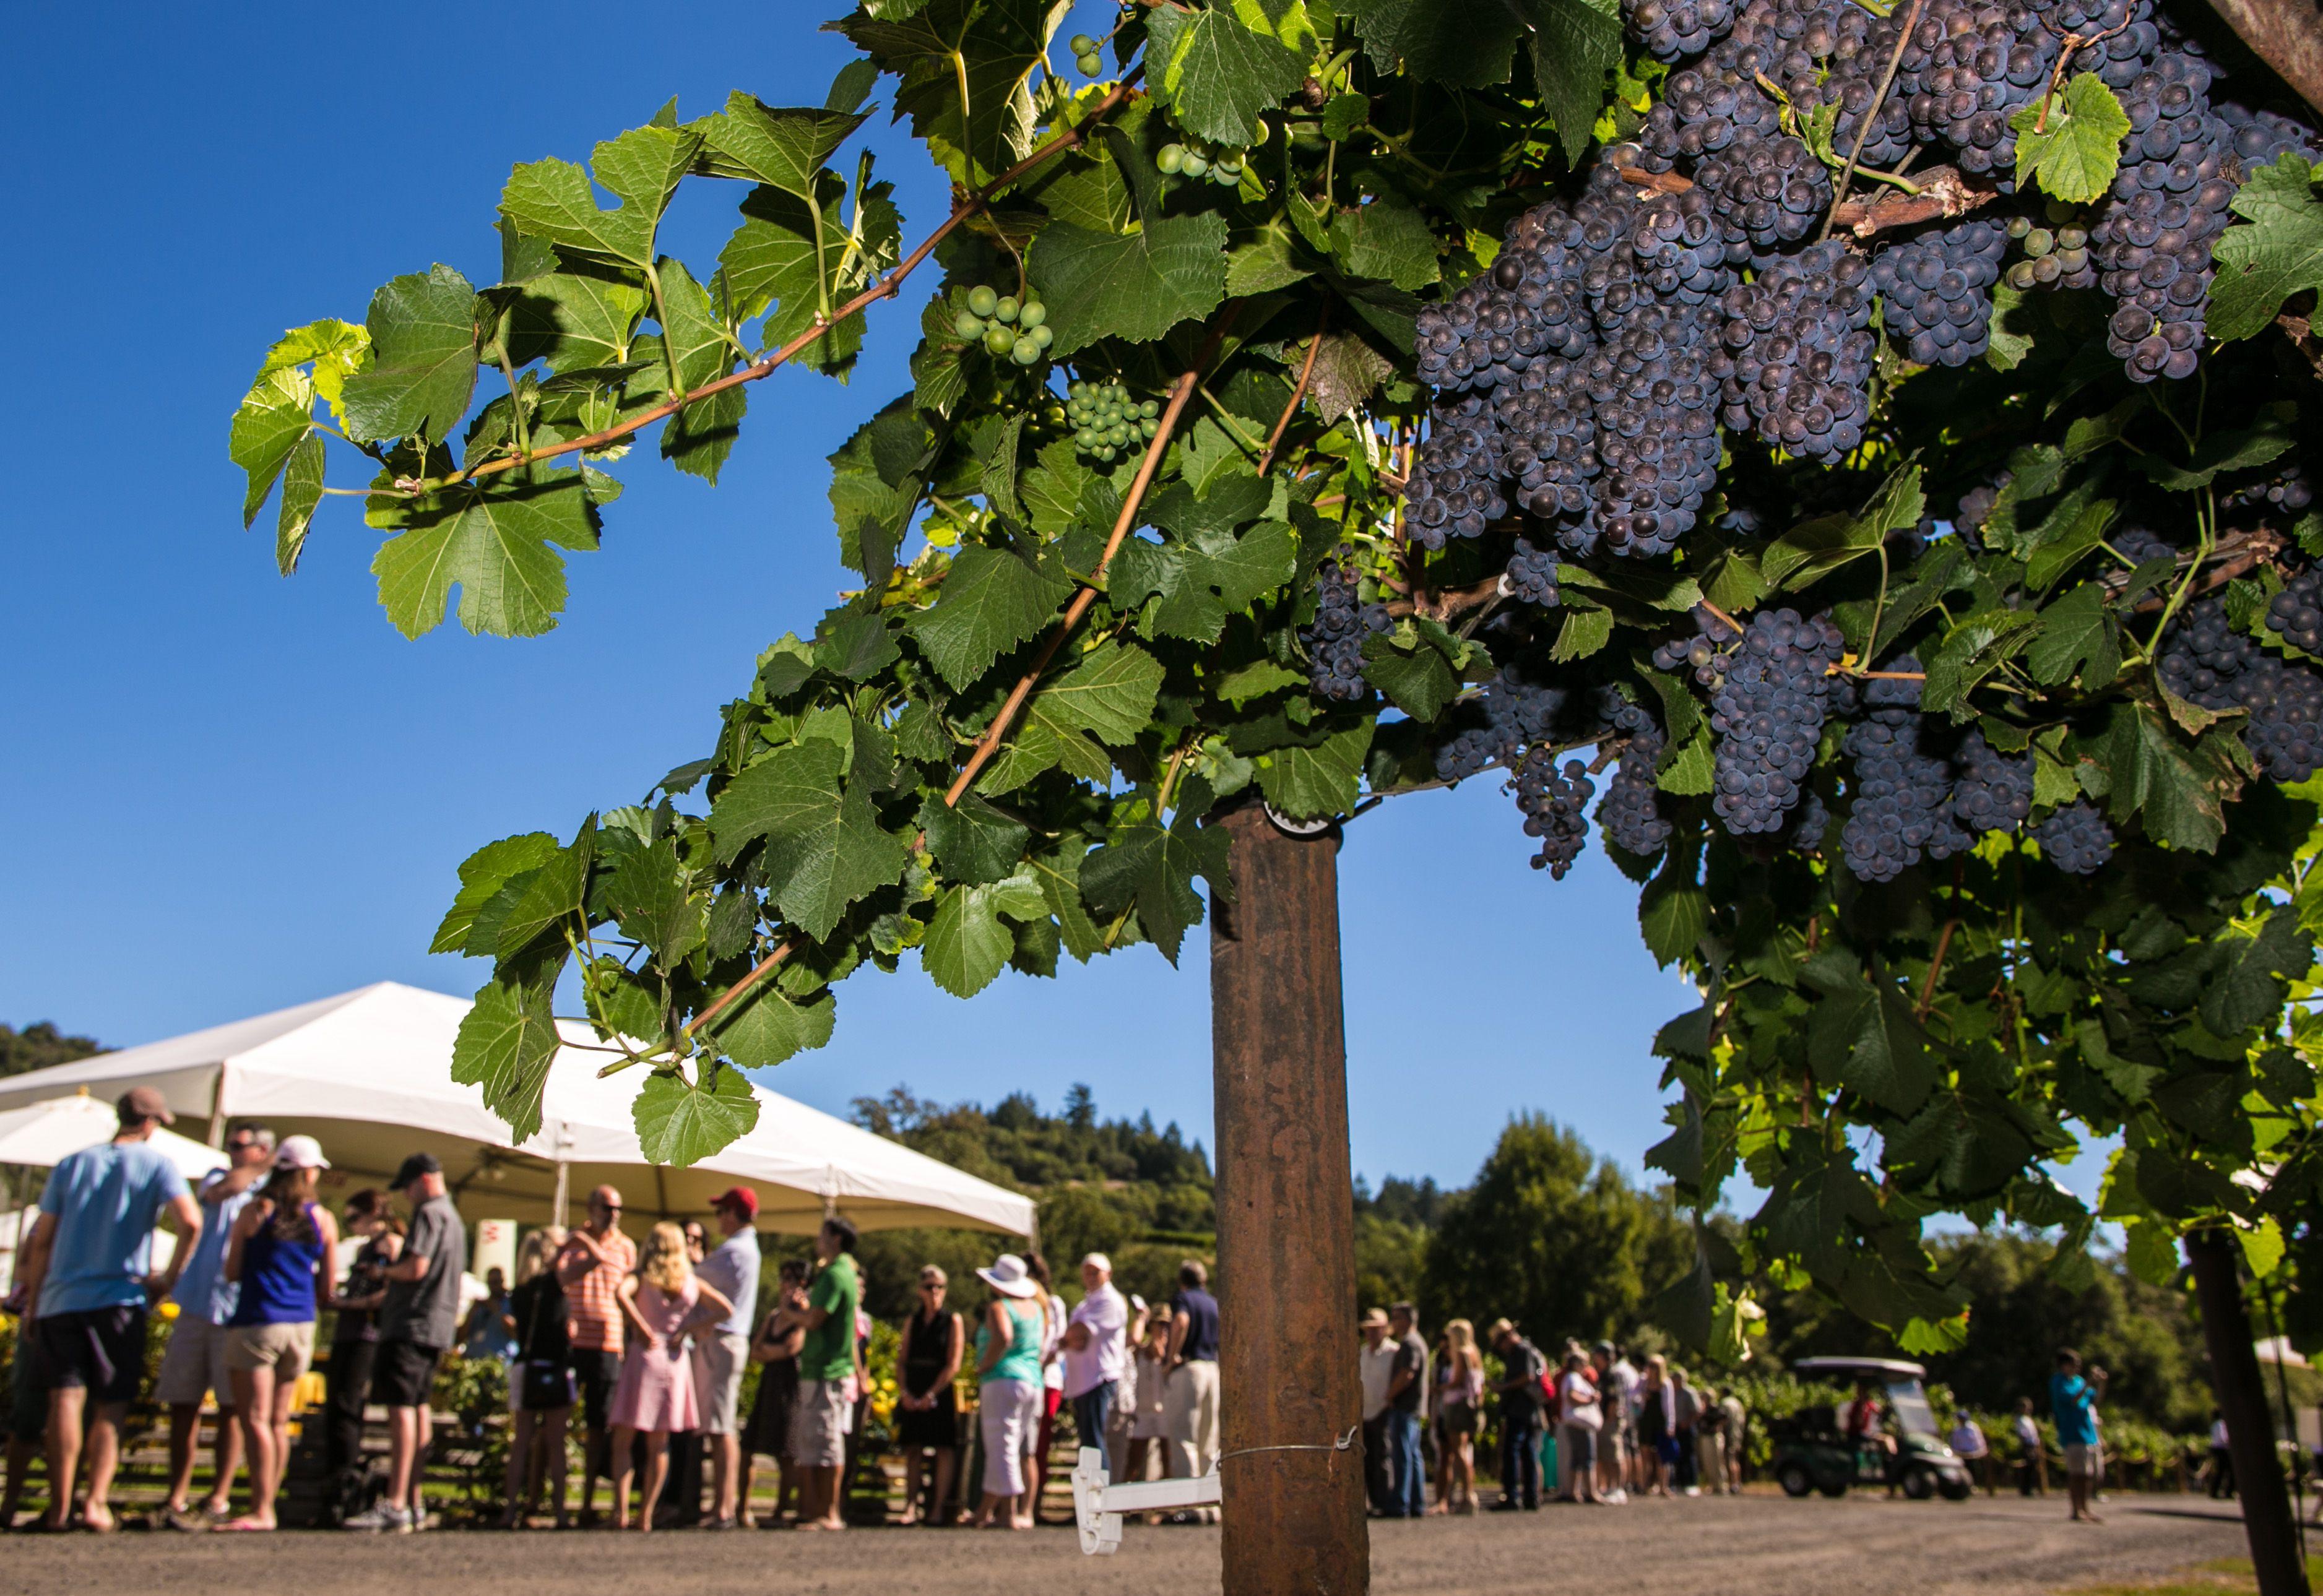 Wine Events Hightlight California's Grape Harvest